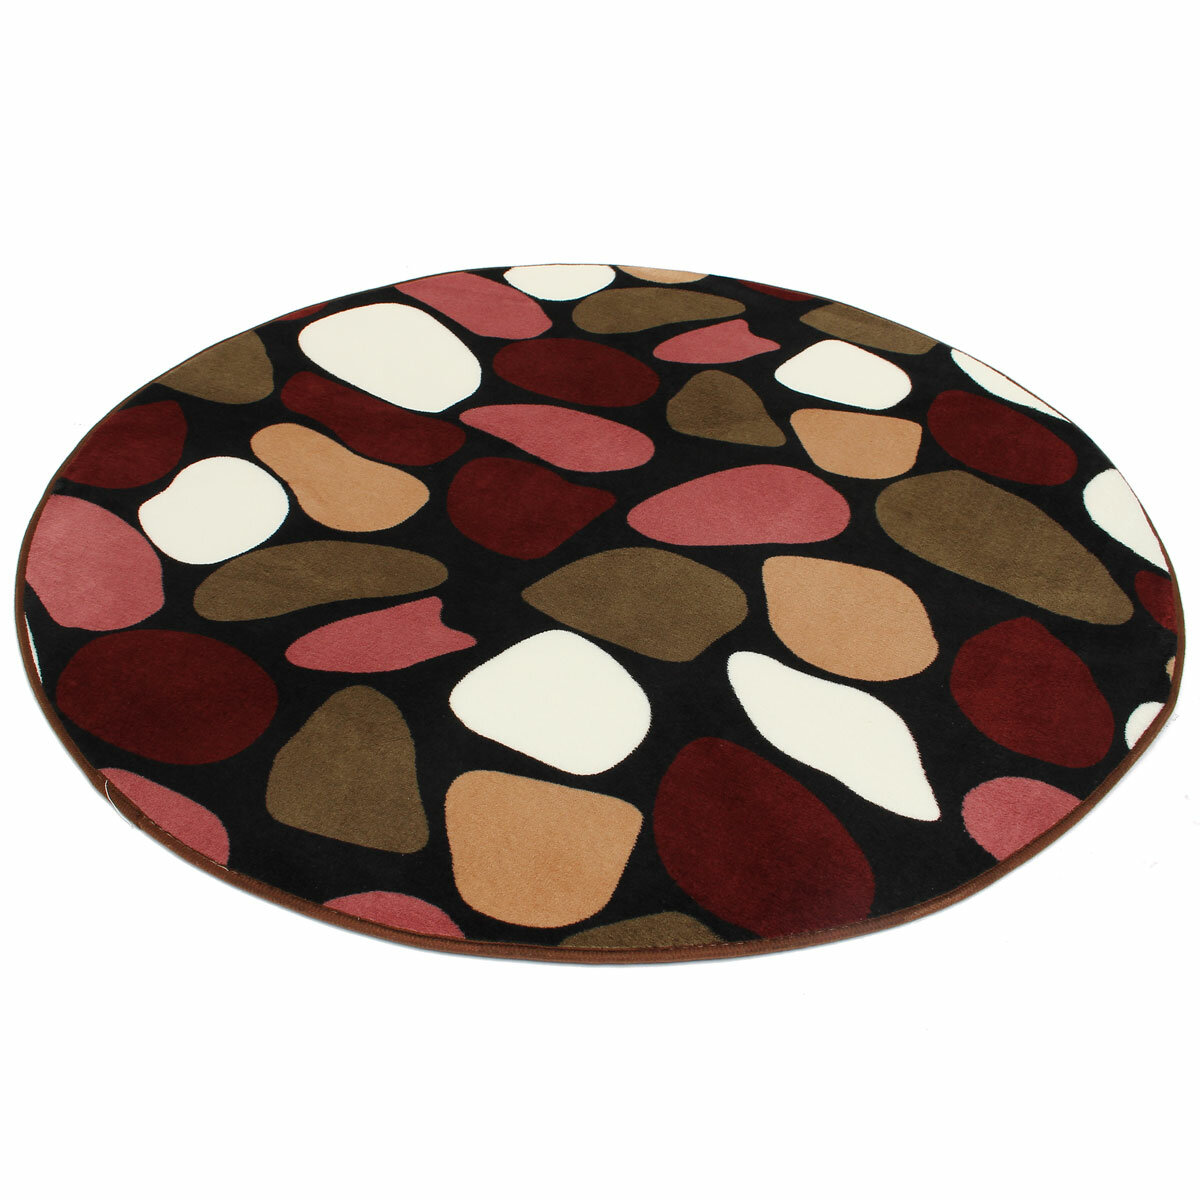 100x100cm Coral Velvet Bathroom Absorbent Carpet Anti Slip Doorsill Round Mat Rug